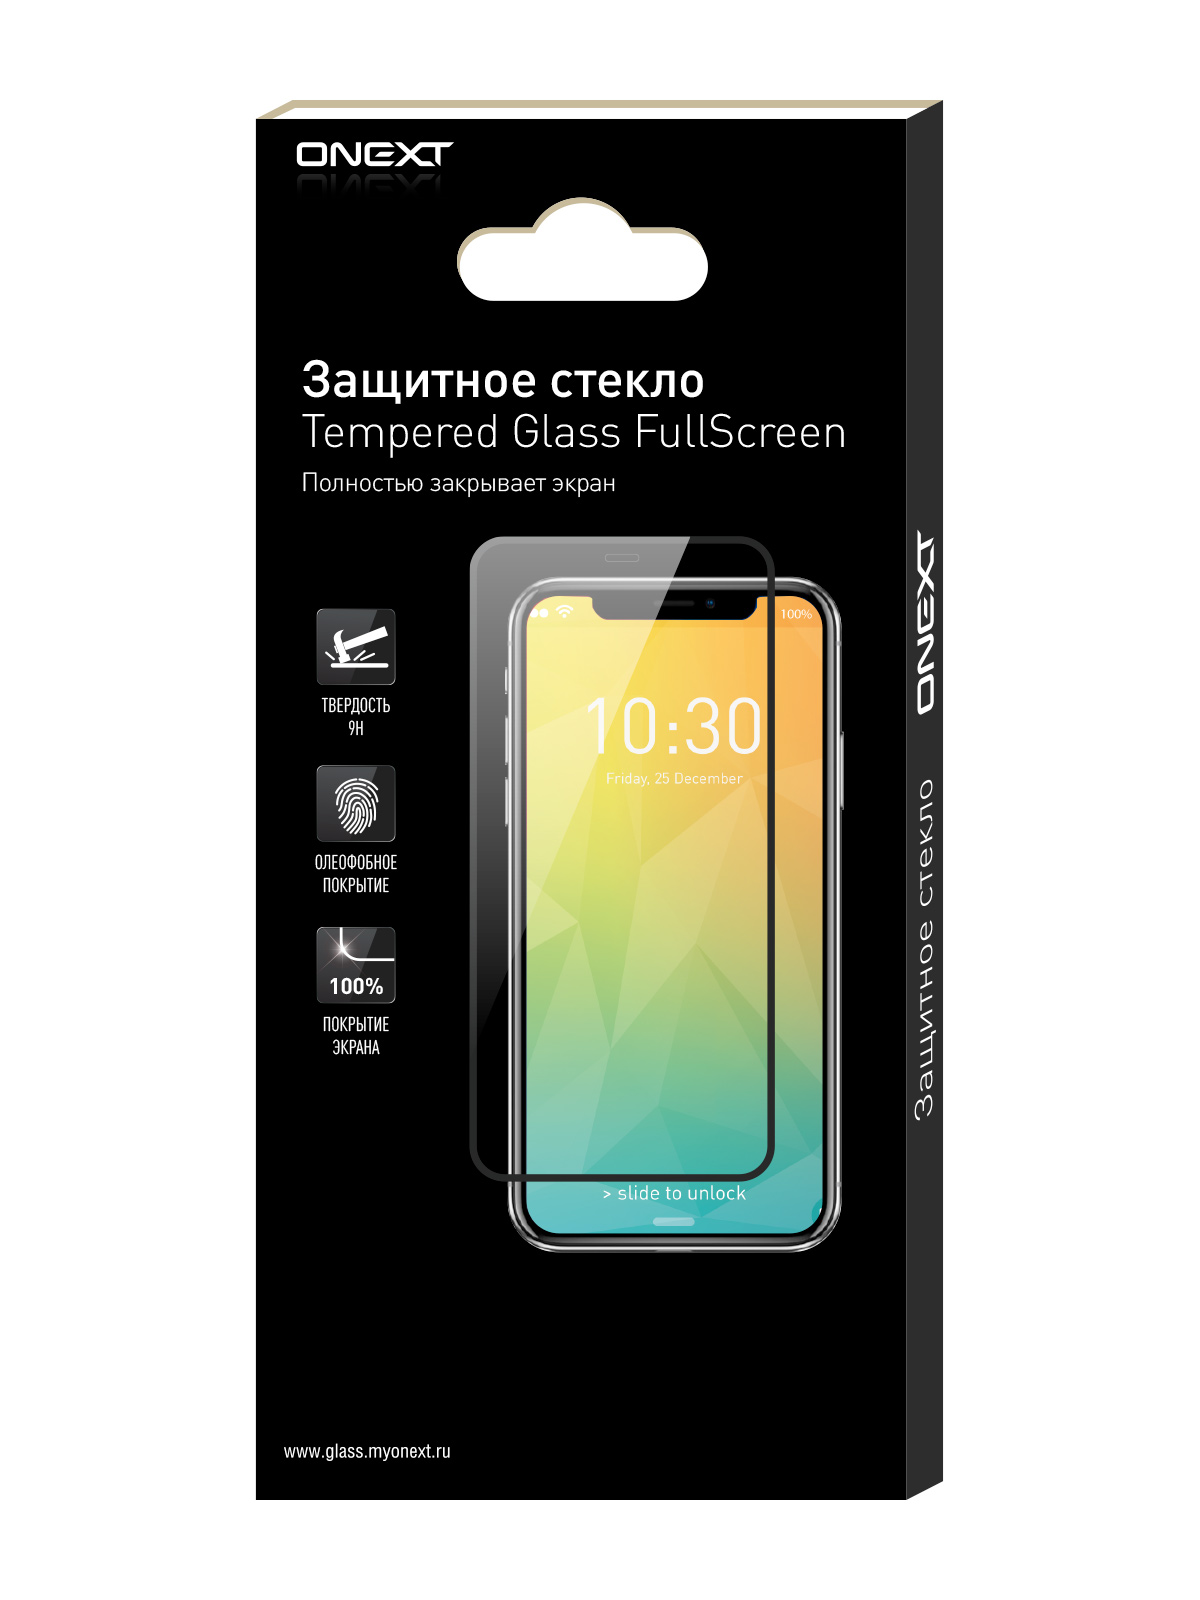 Защитное стекло ONEXT для Asus ZenFone 3 Laser (ZC551KL) Gold